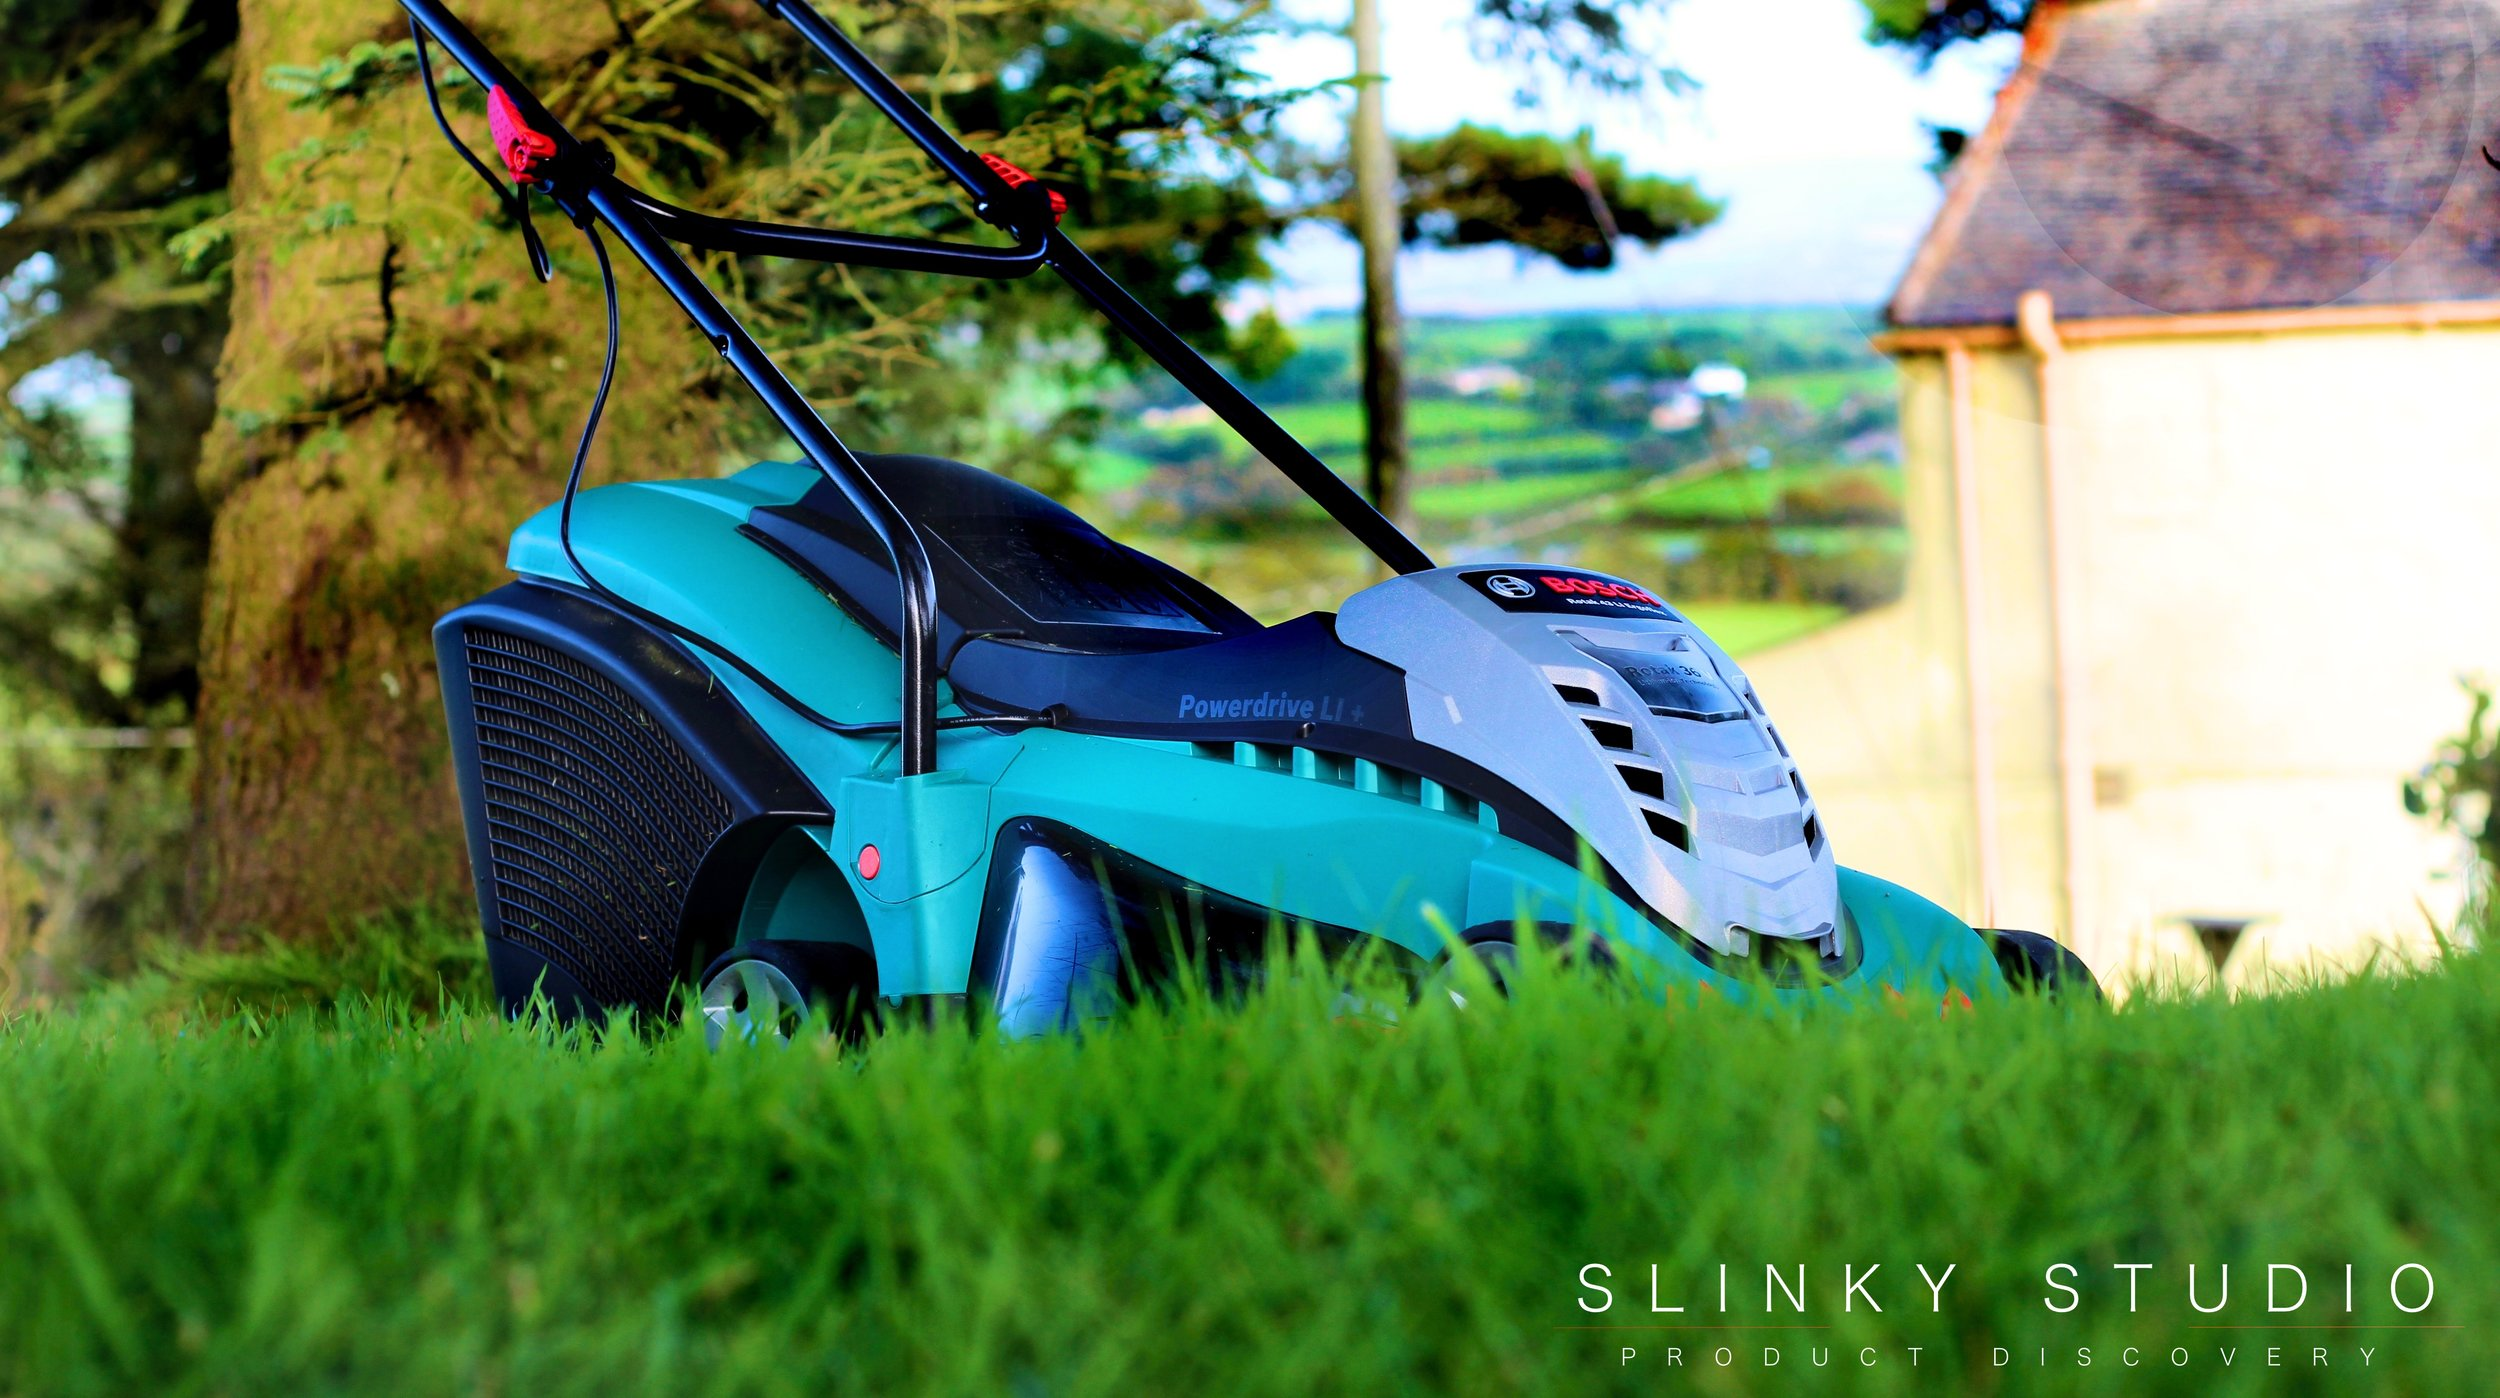 Bosch Rotak 43 LI Ergoflex Cordless Lawnmower Low Profile View.jpg